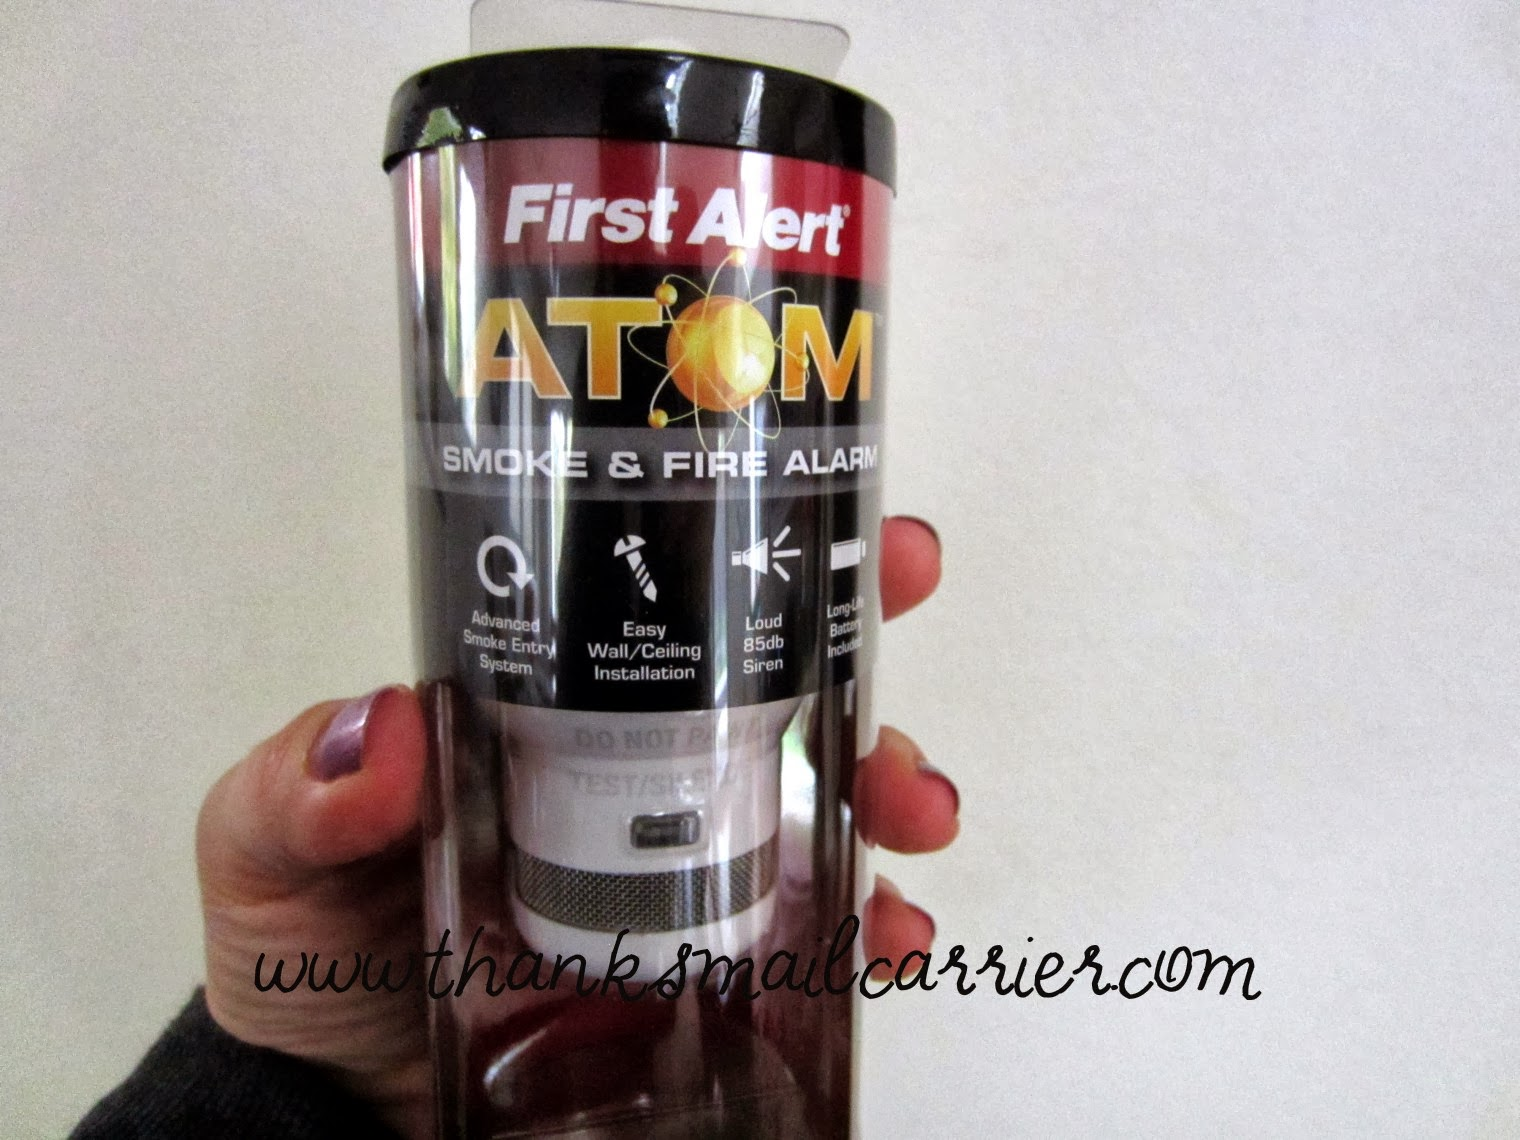 First Alert Atom Alarm